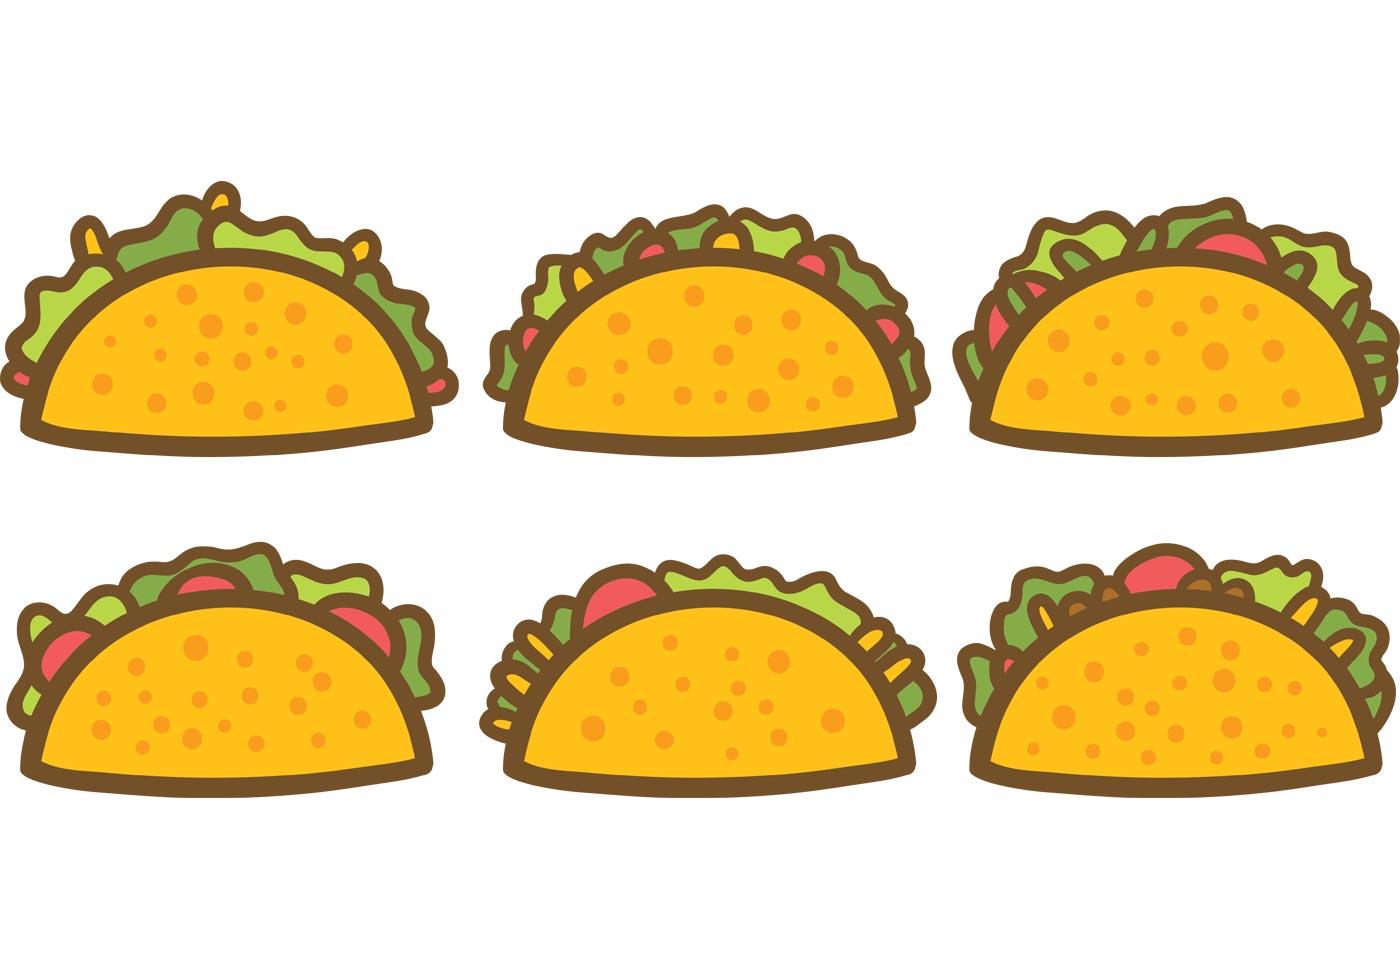 Free Taco Vectors - Download Free Vector Art, Stock Graphics & Images